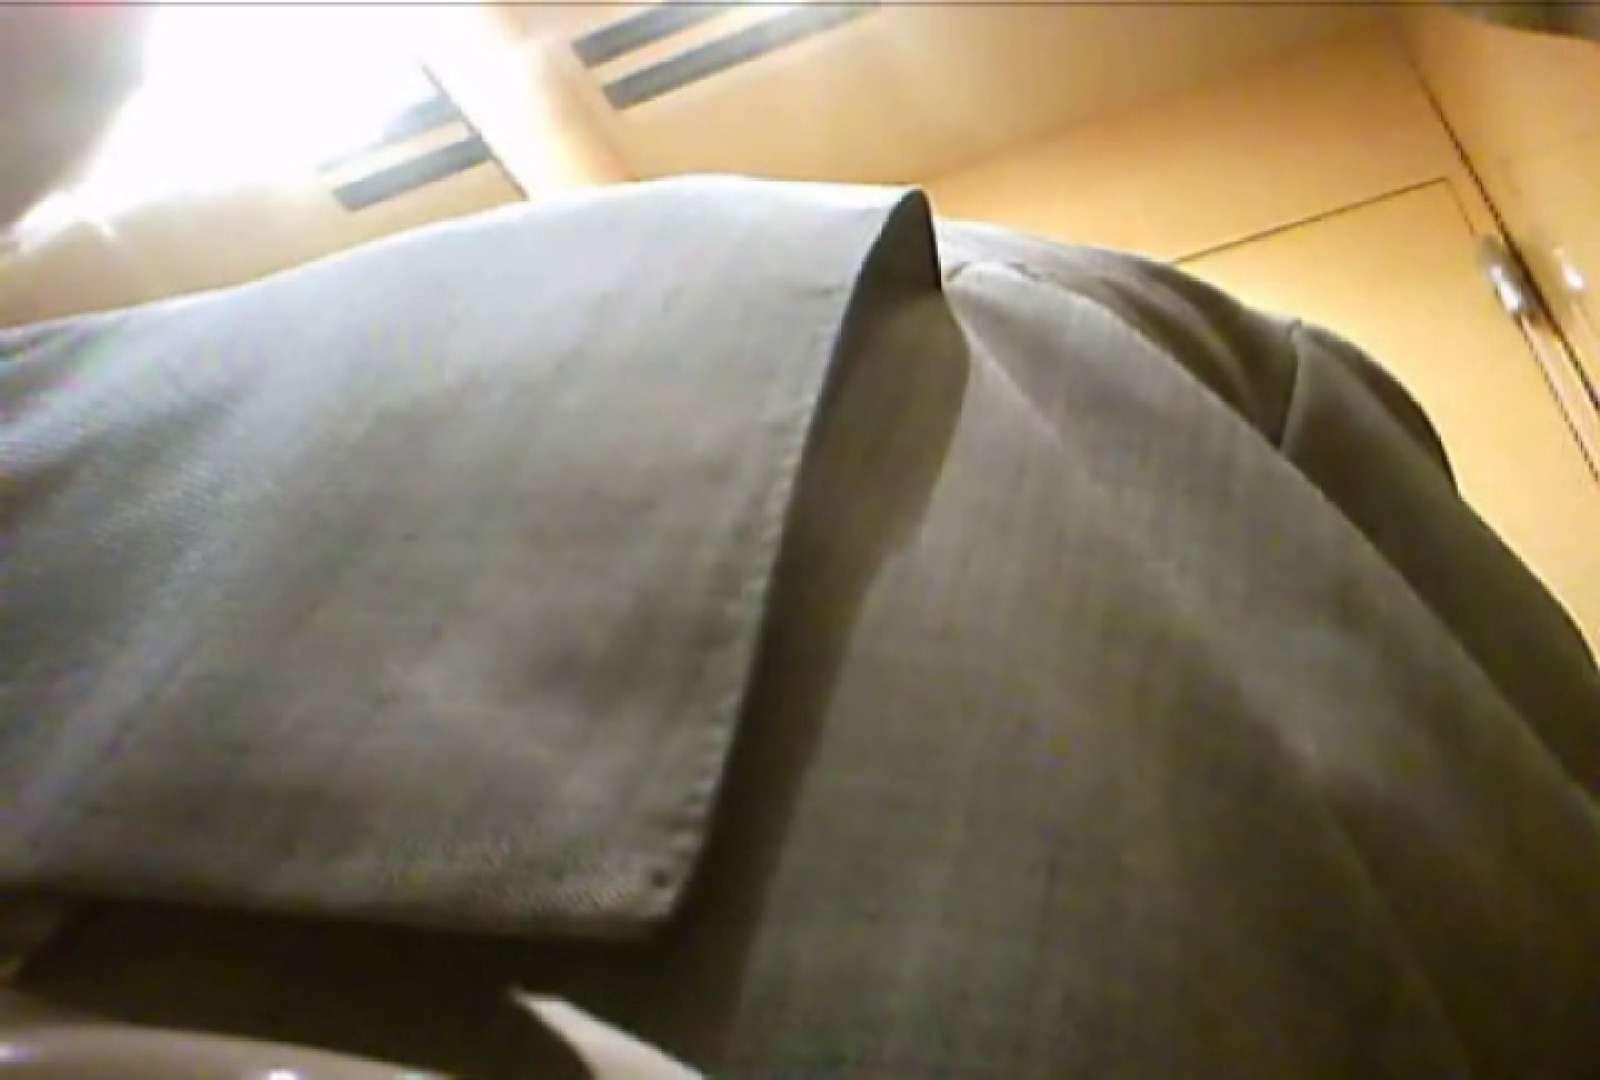 SEASON 2ND!掴み取りさんの洗面所覗き!in新幹線!VOL.02 スーツボーイズ | ノンケボーイズ  82pic 29